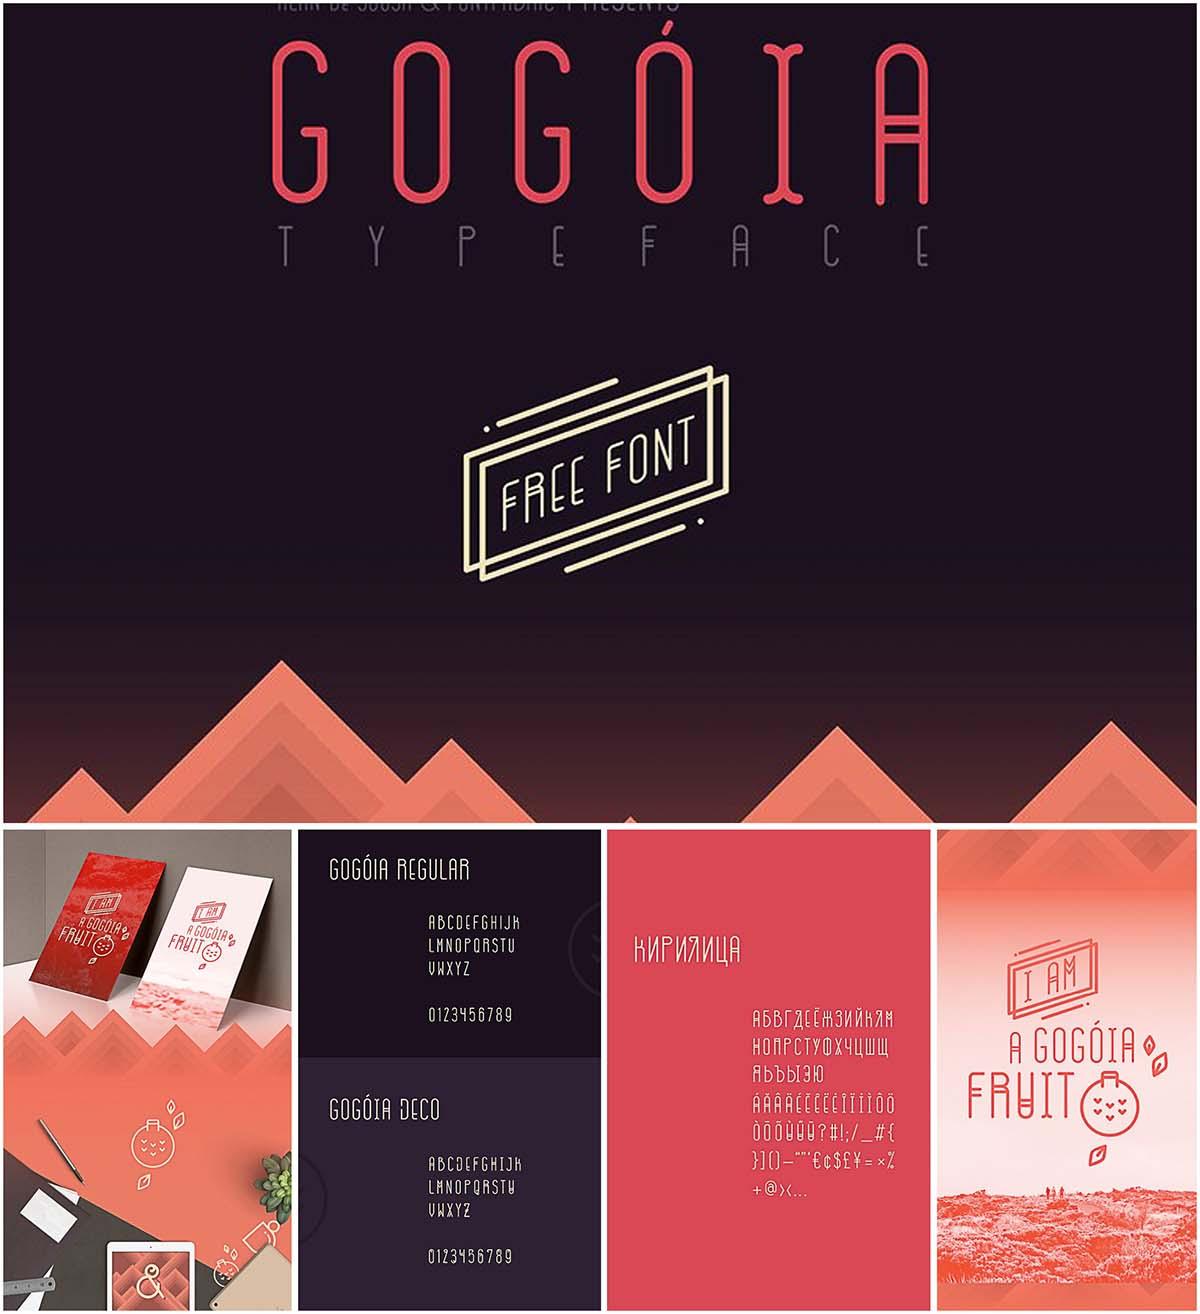 Gogoia decorative font